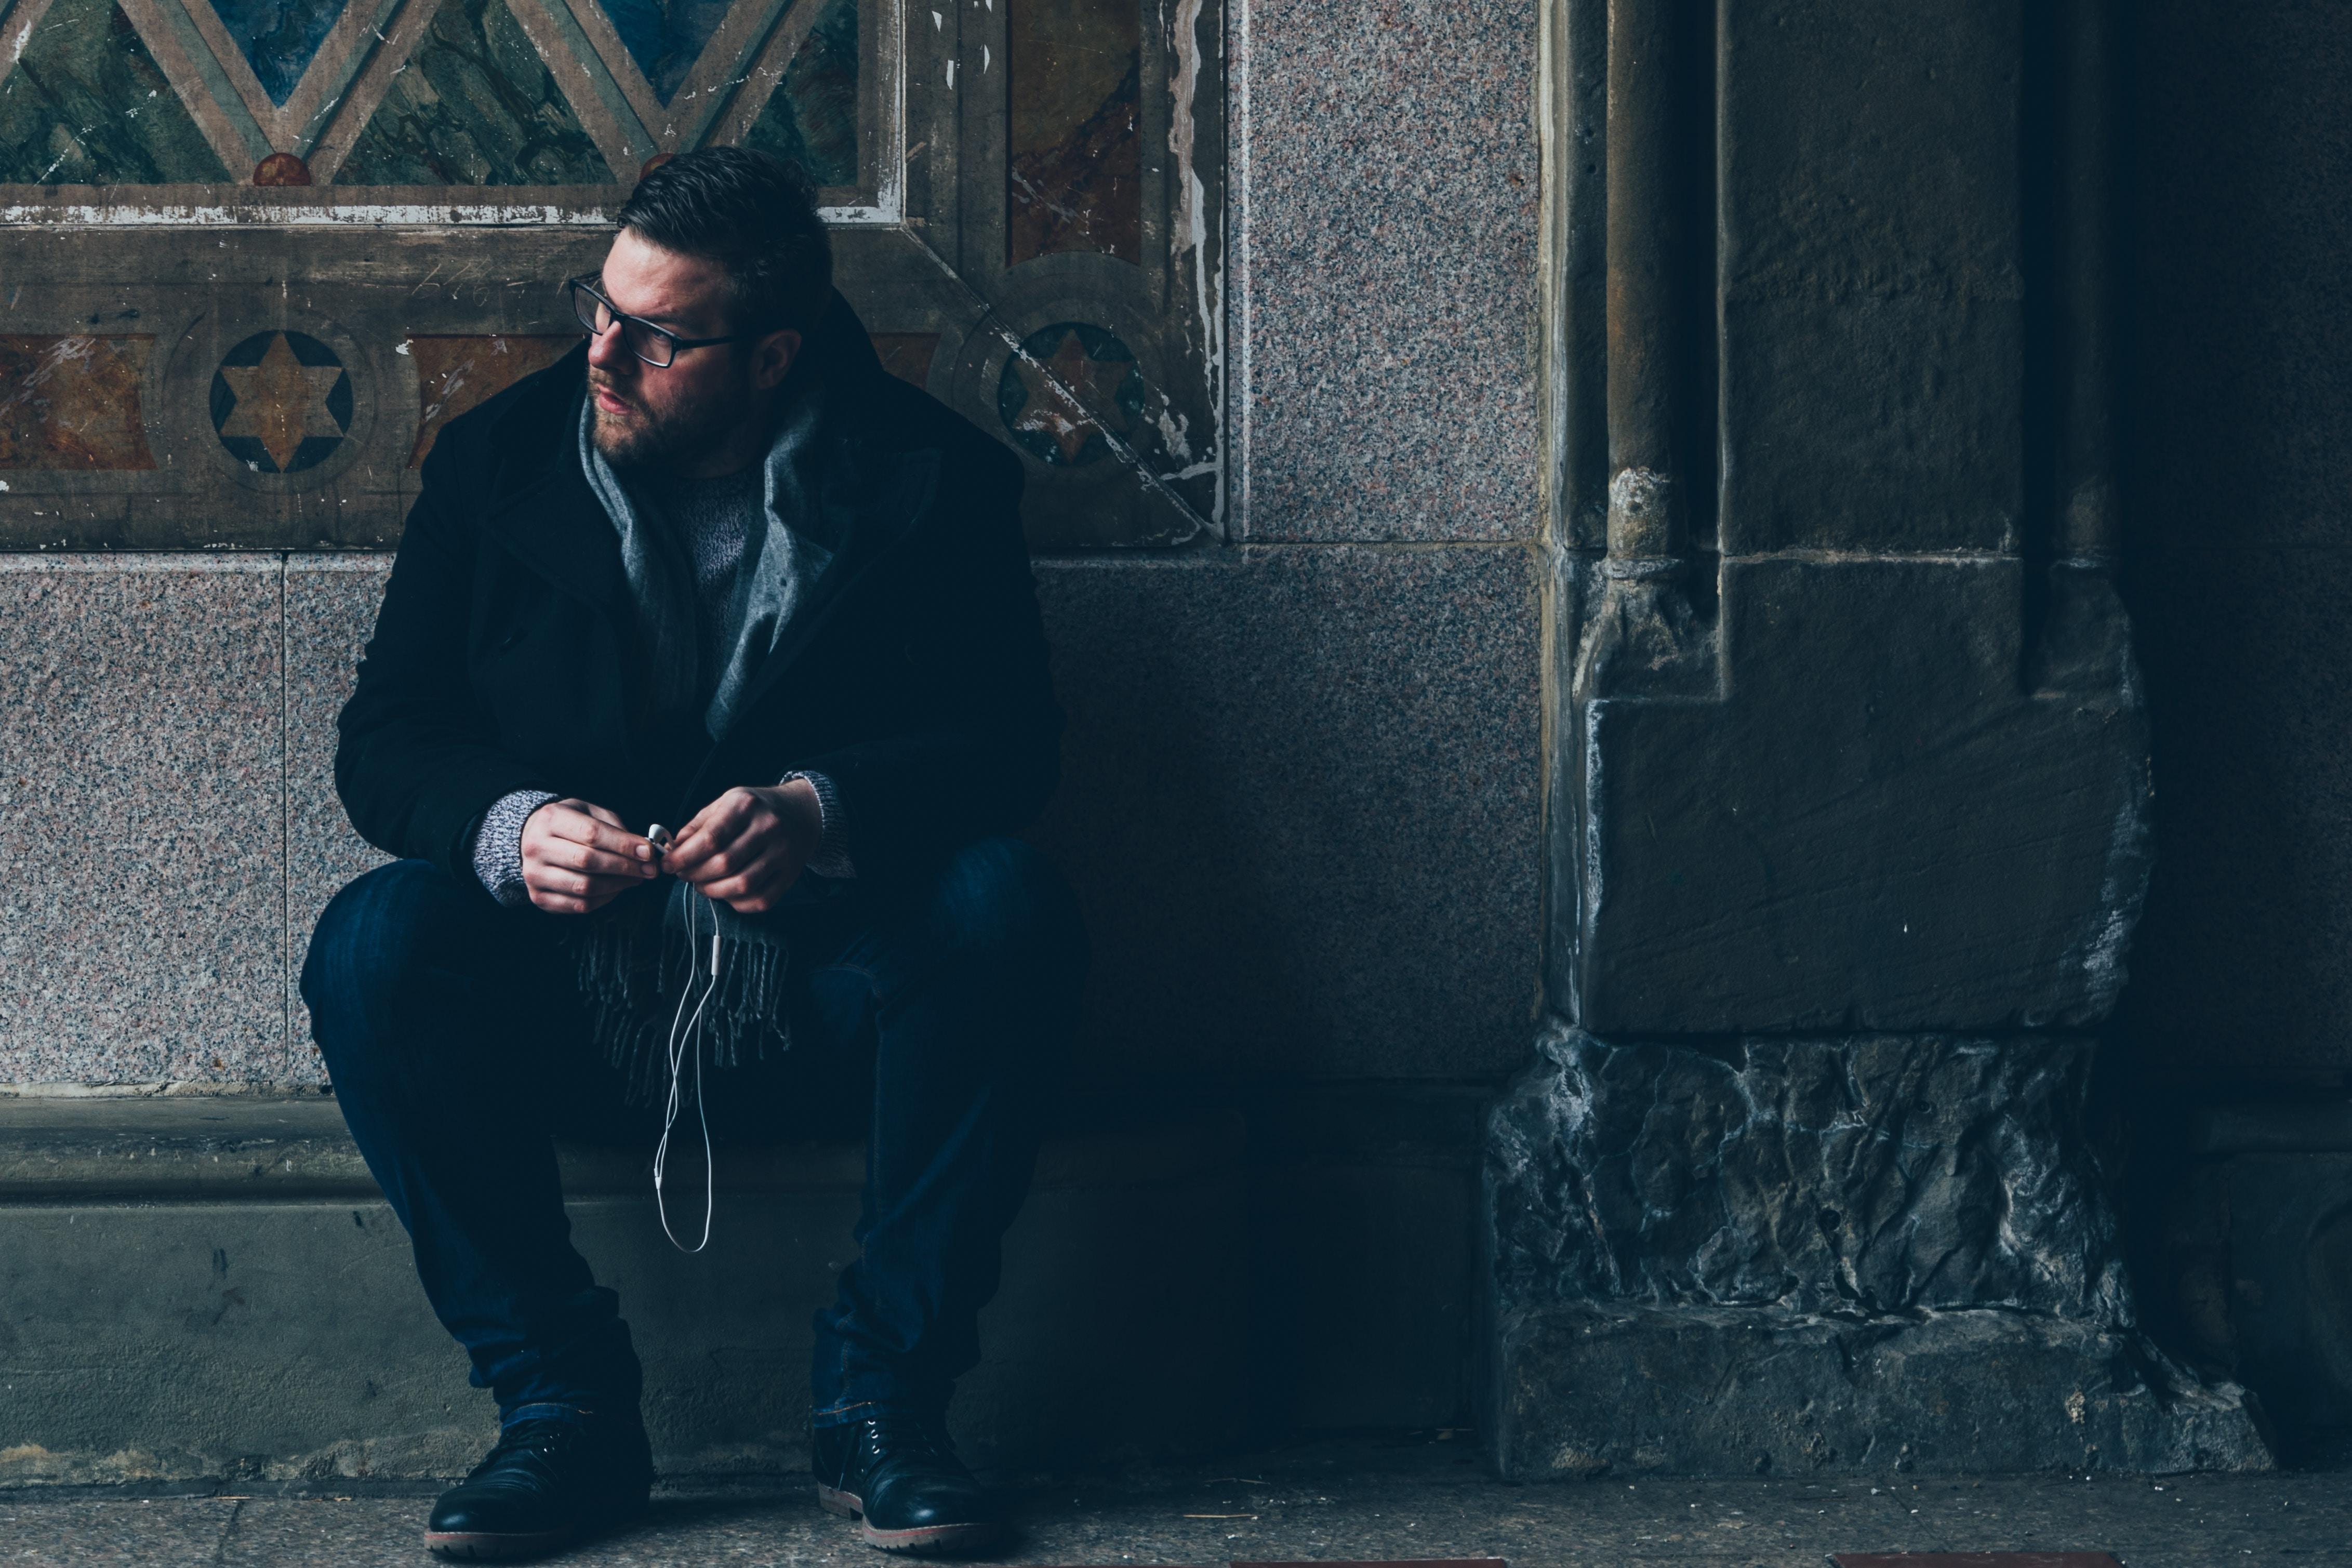 man sitting on pavement on vignette photography